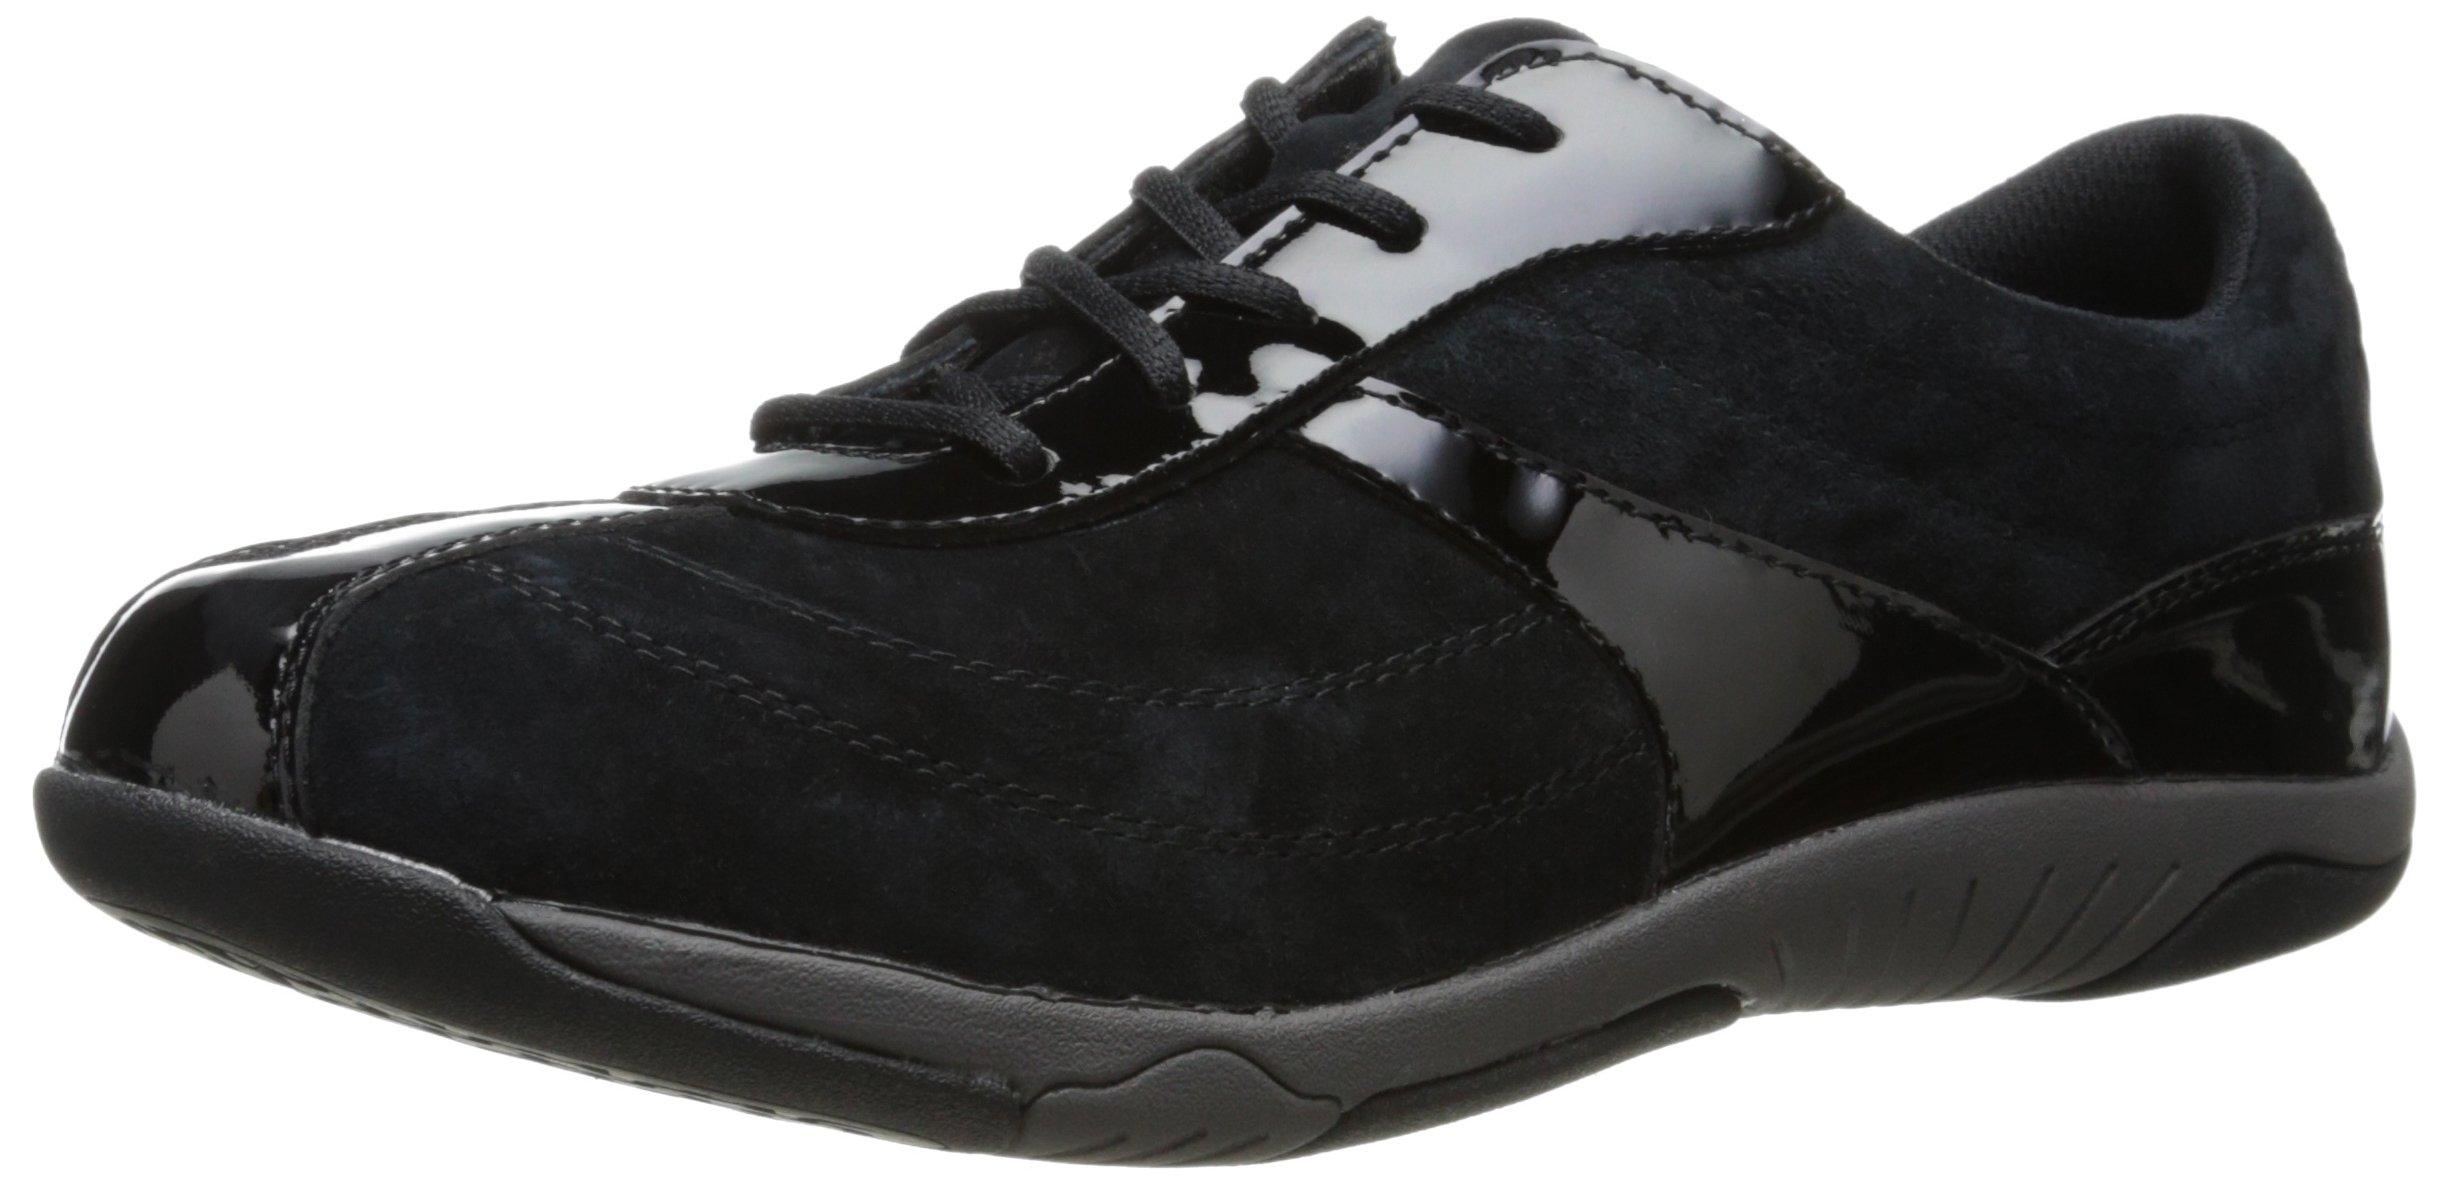 Propét Propet W3239Damen Travel Walker II Sneakers Sportschuhe, Grau - Taupe Mesh - Größe: 40 1/2 EU